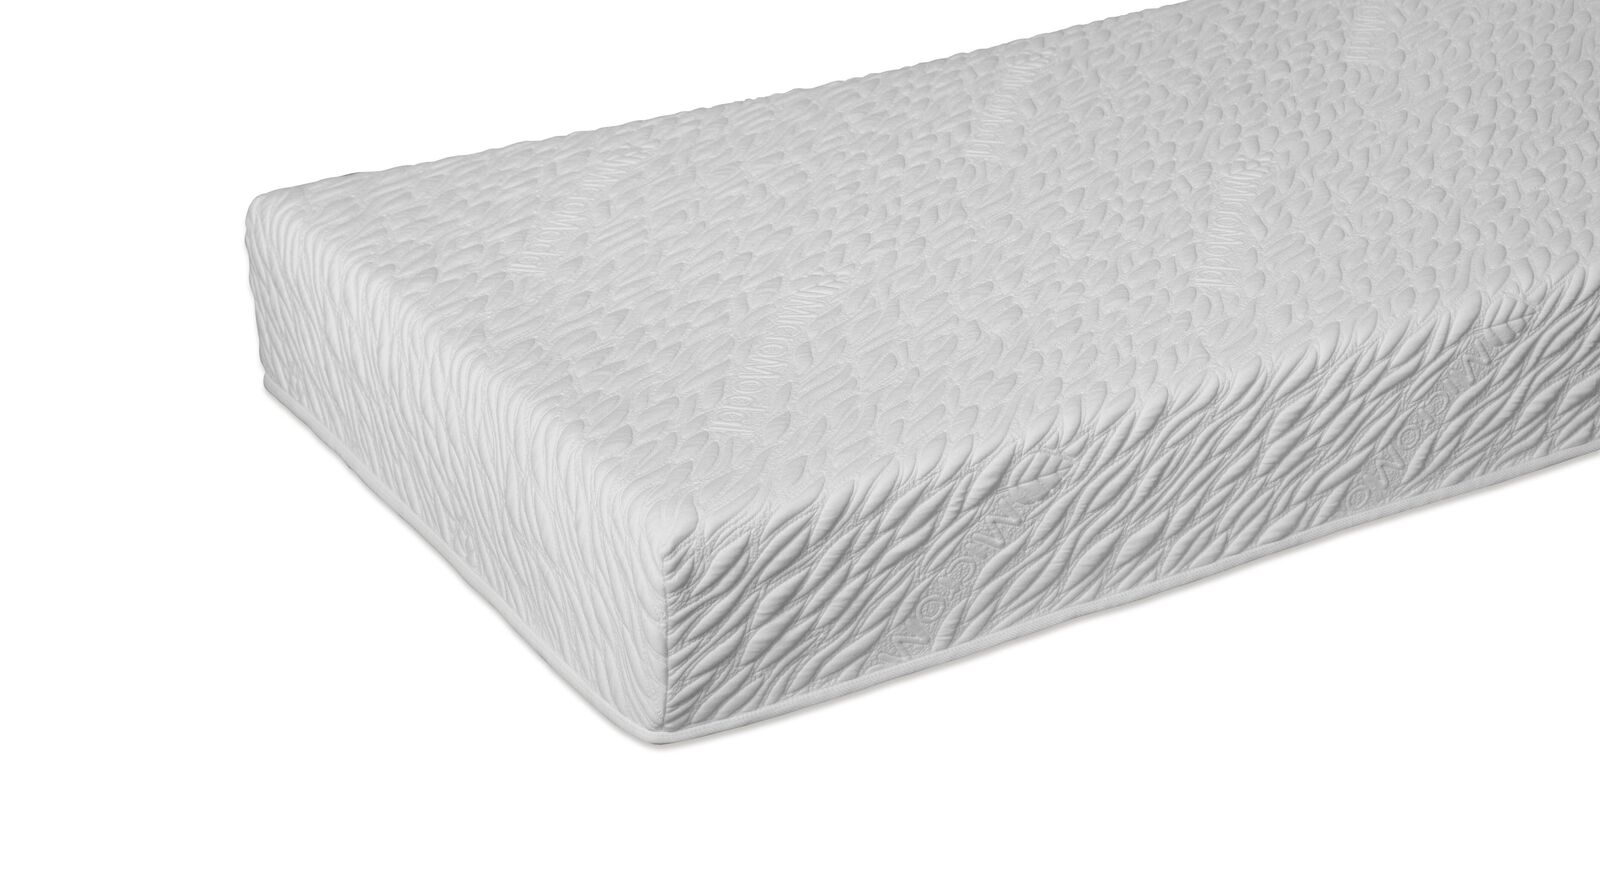 Gelschaum-Matratze Clever Sleep Comfort mit 7 Zonen